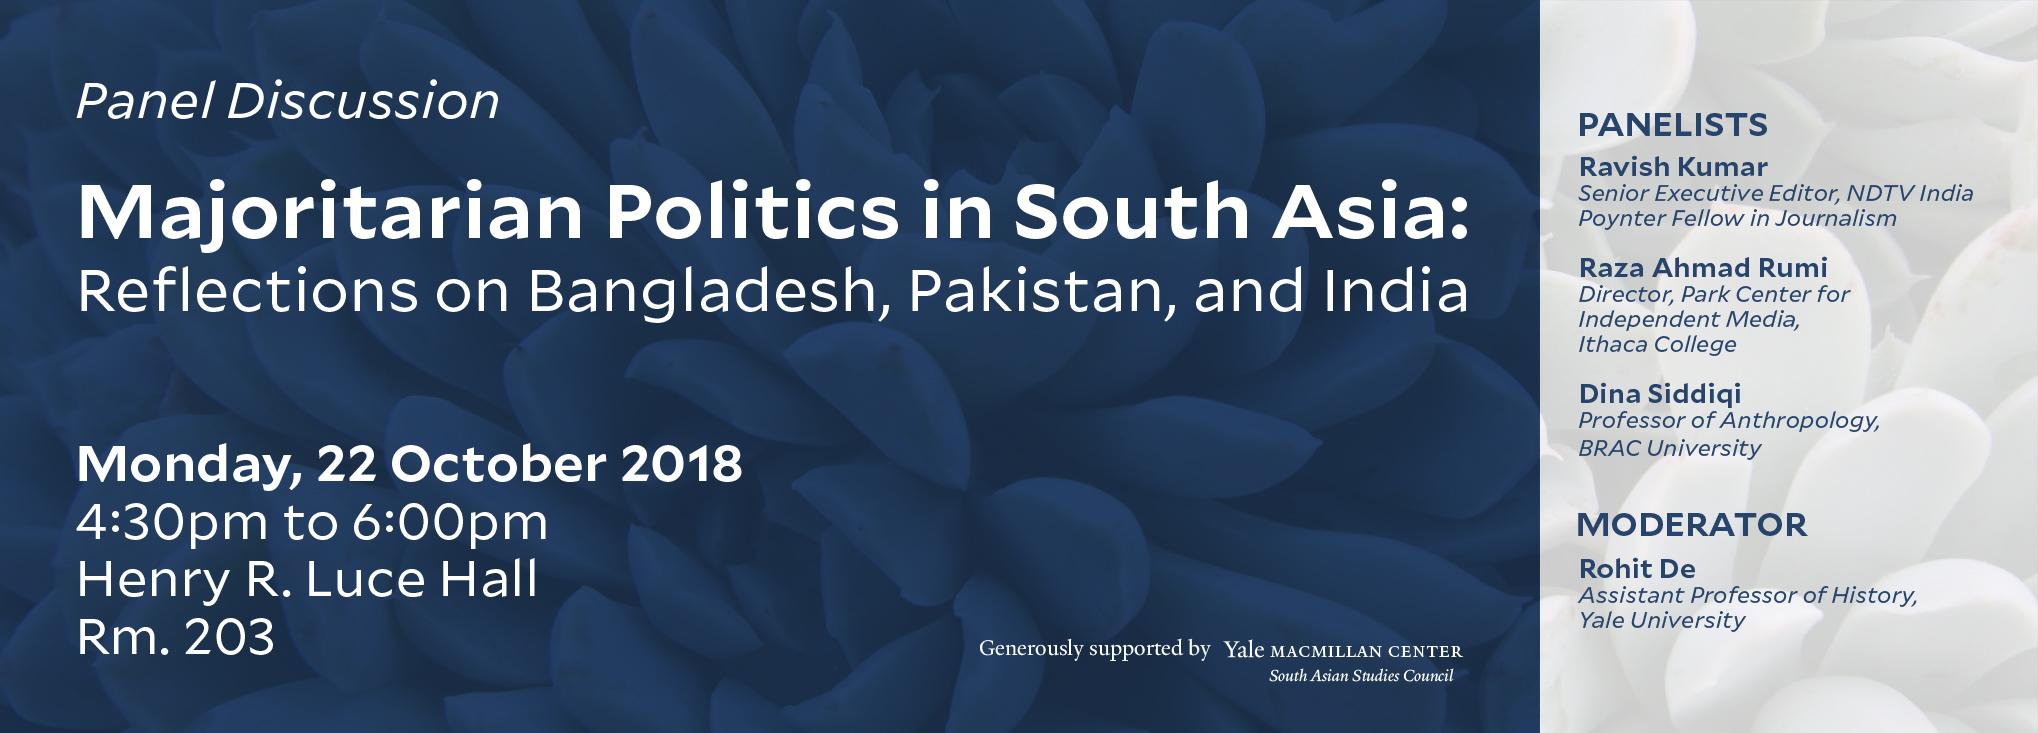 Majoritarian Politics in South Asia